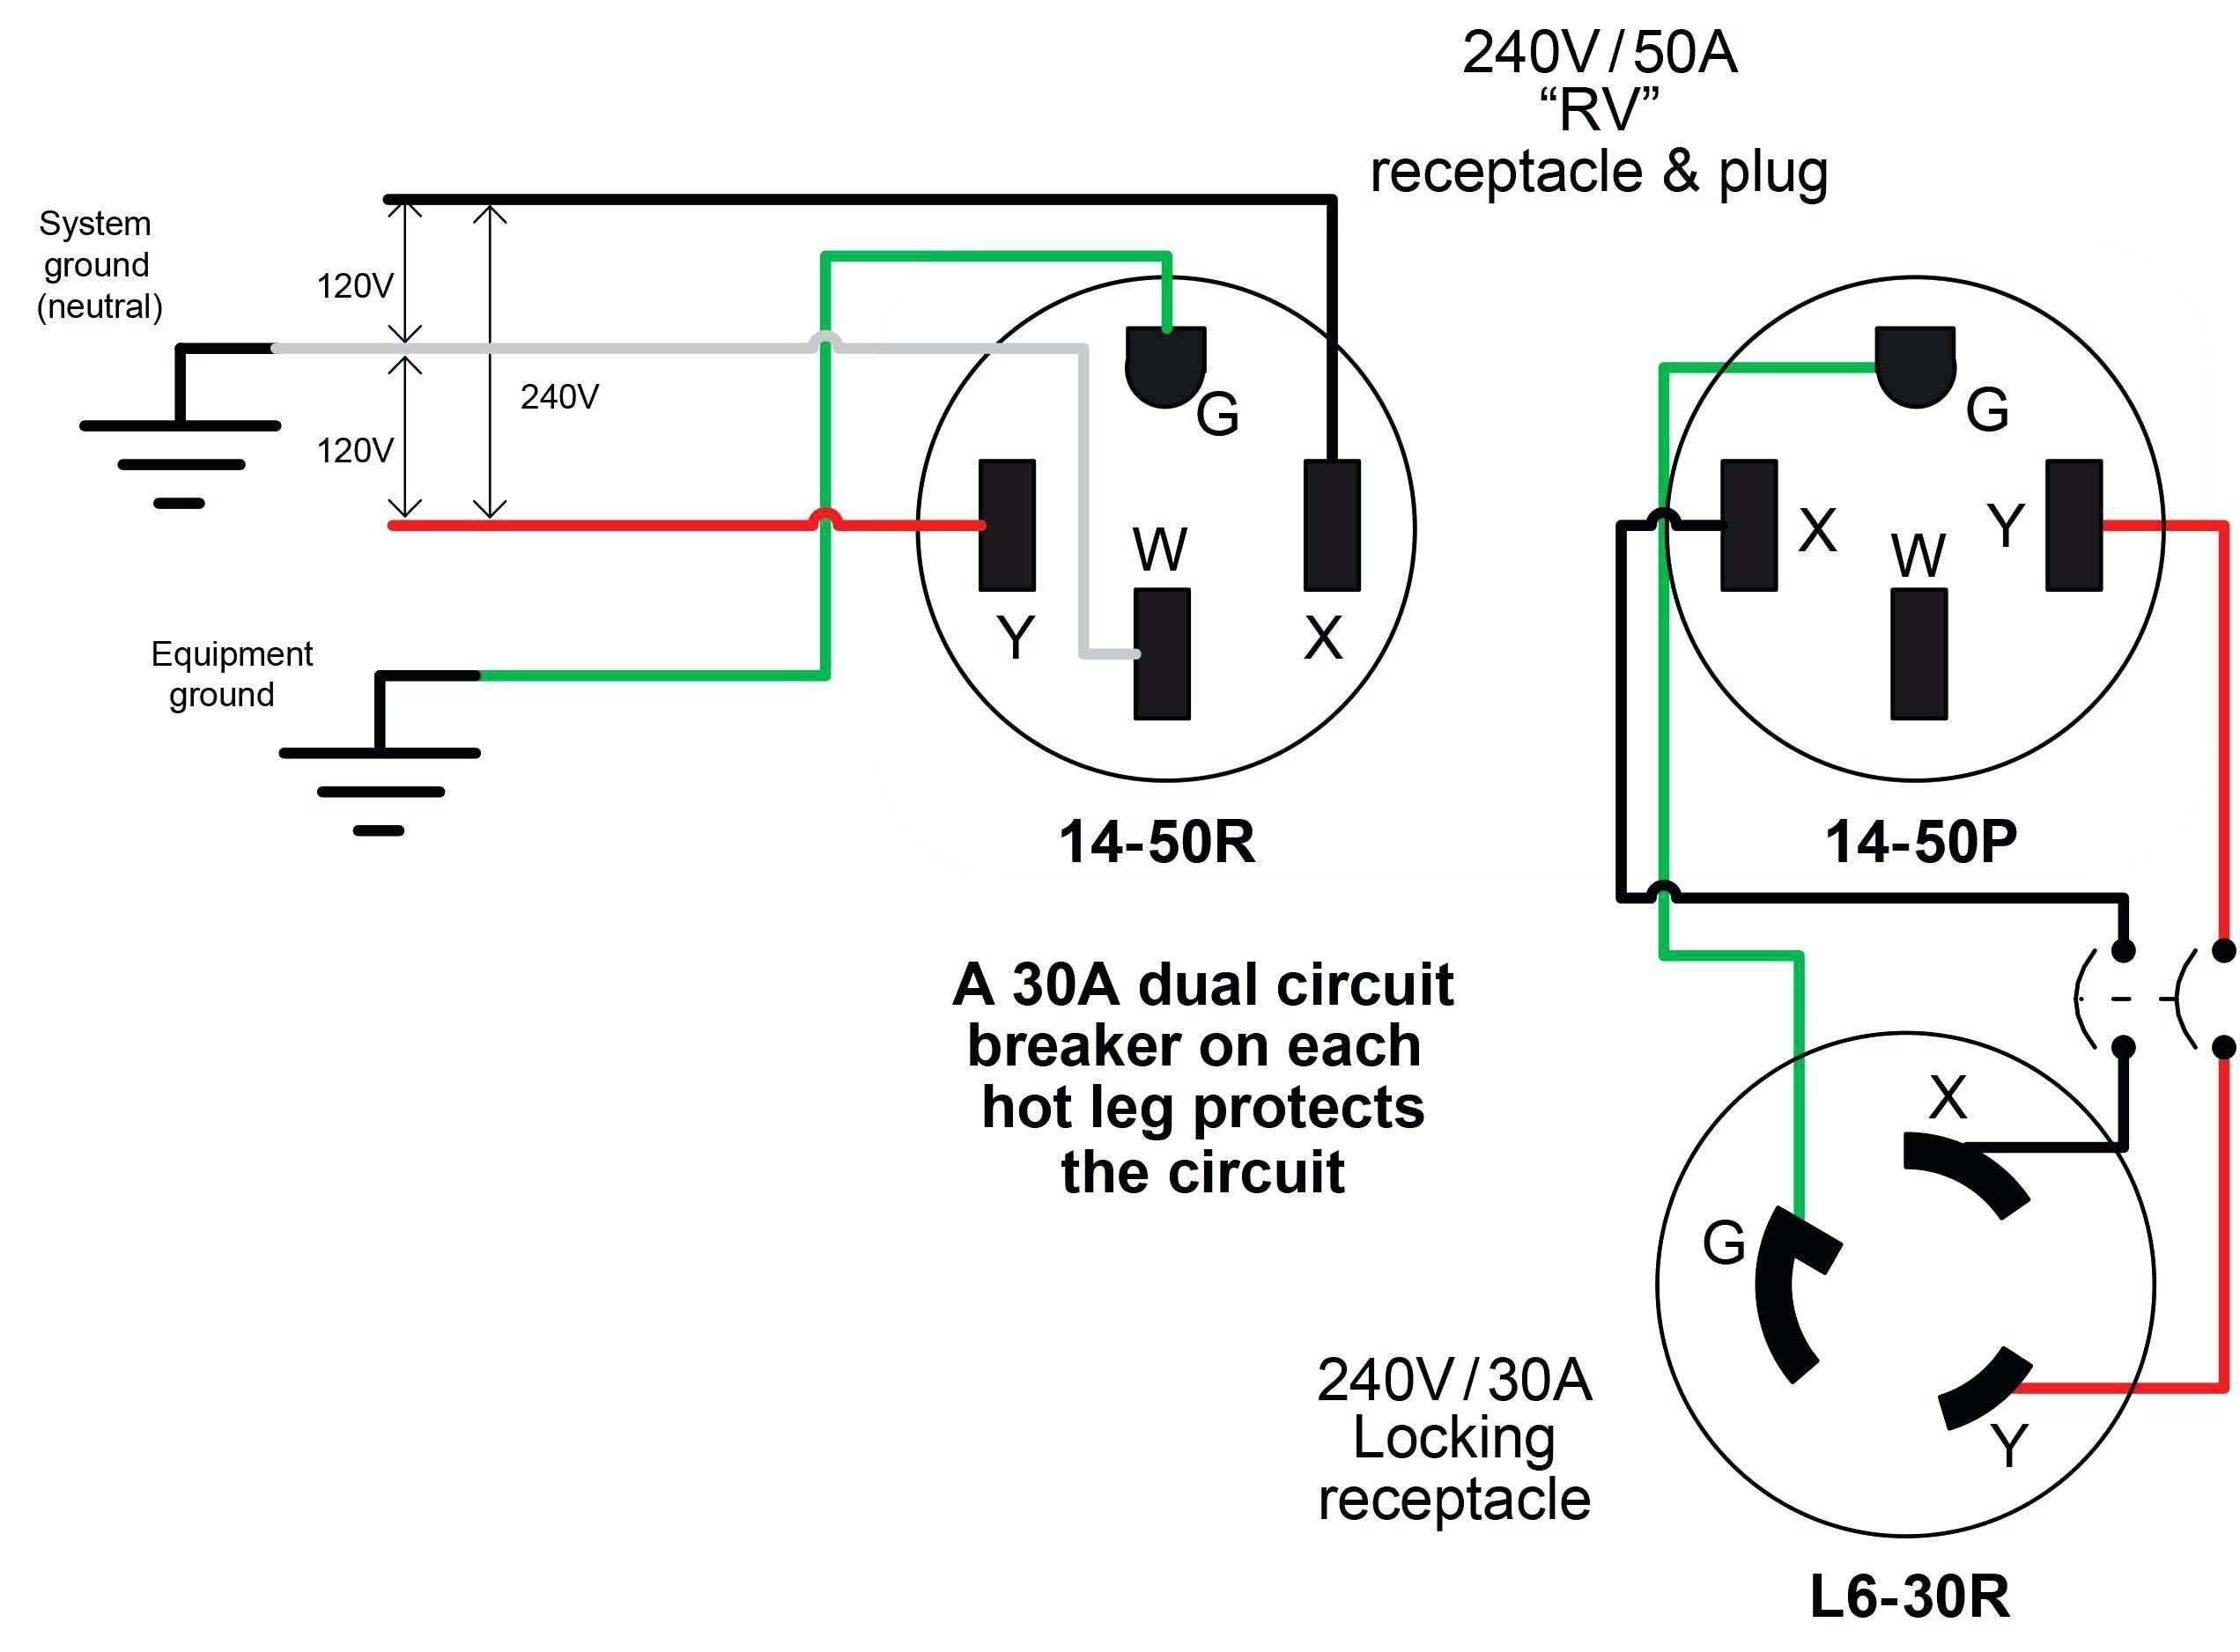 4 Prong Twist Lock Plug Wiring Diagram Inspirational Cool L14 30 Plug Wiring Diagram Electrical and